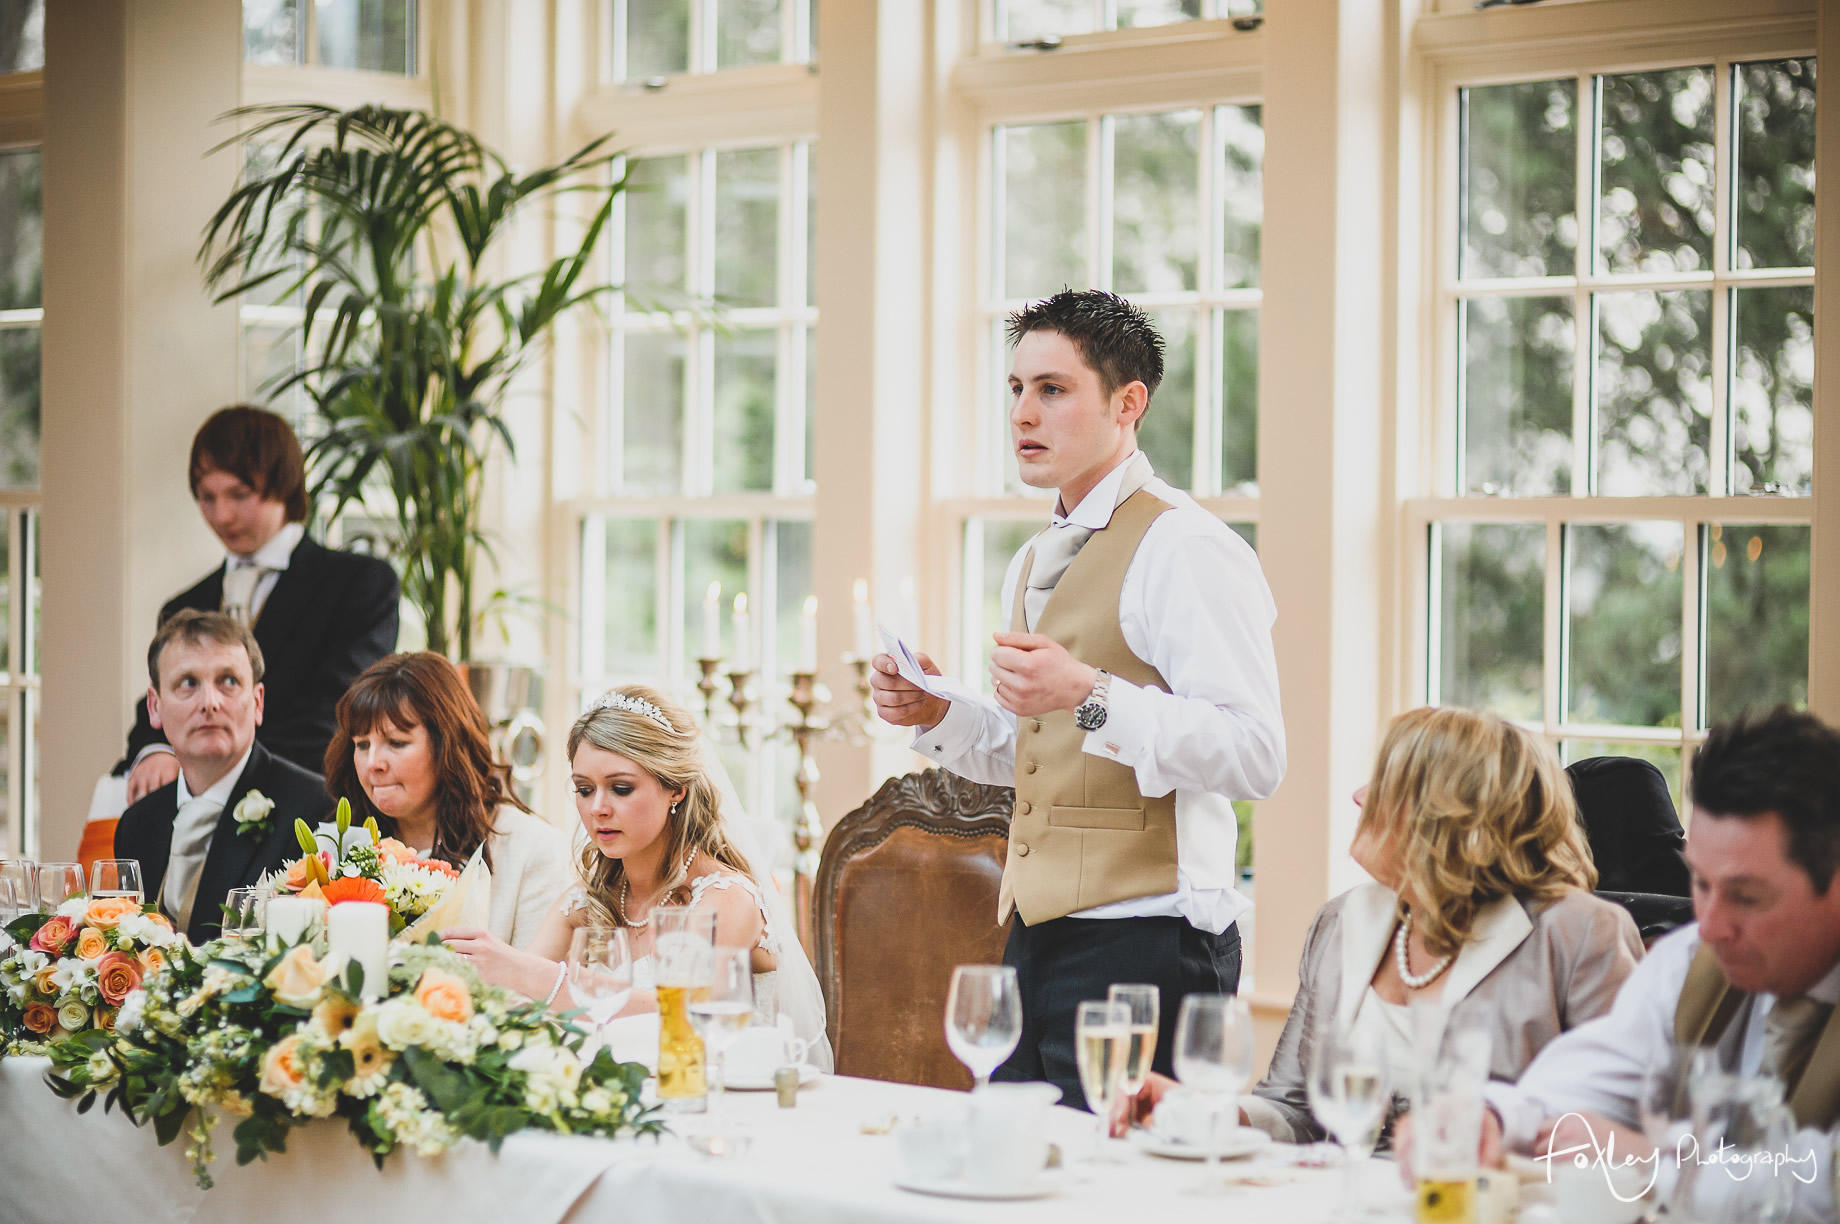 Gemma and Lewis' Wedding at Mitton Hall 130